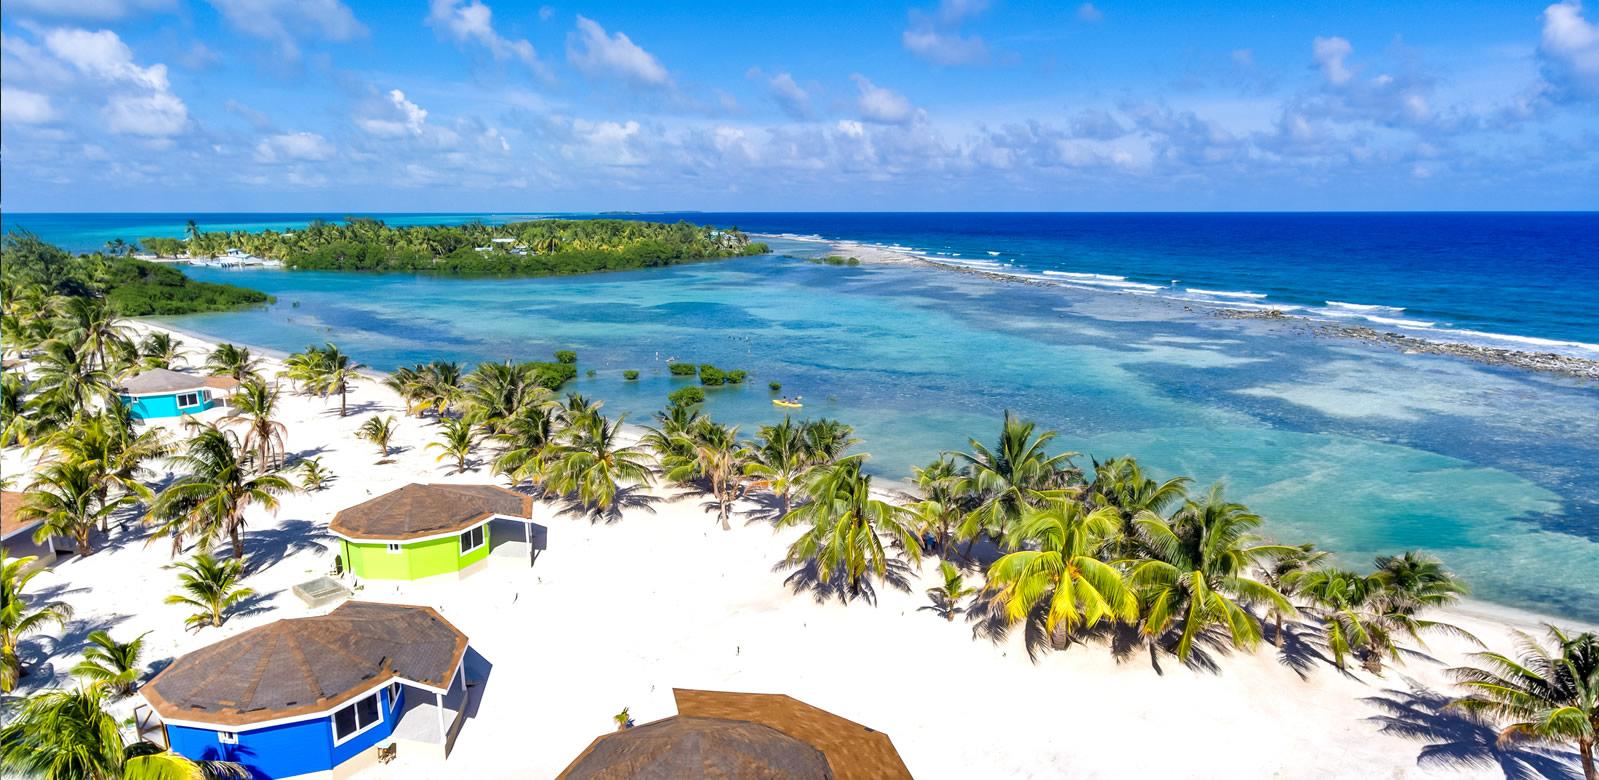 Belize Vacation Specials - Drone Image